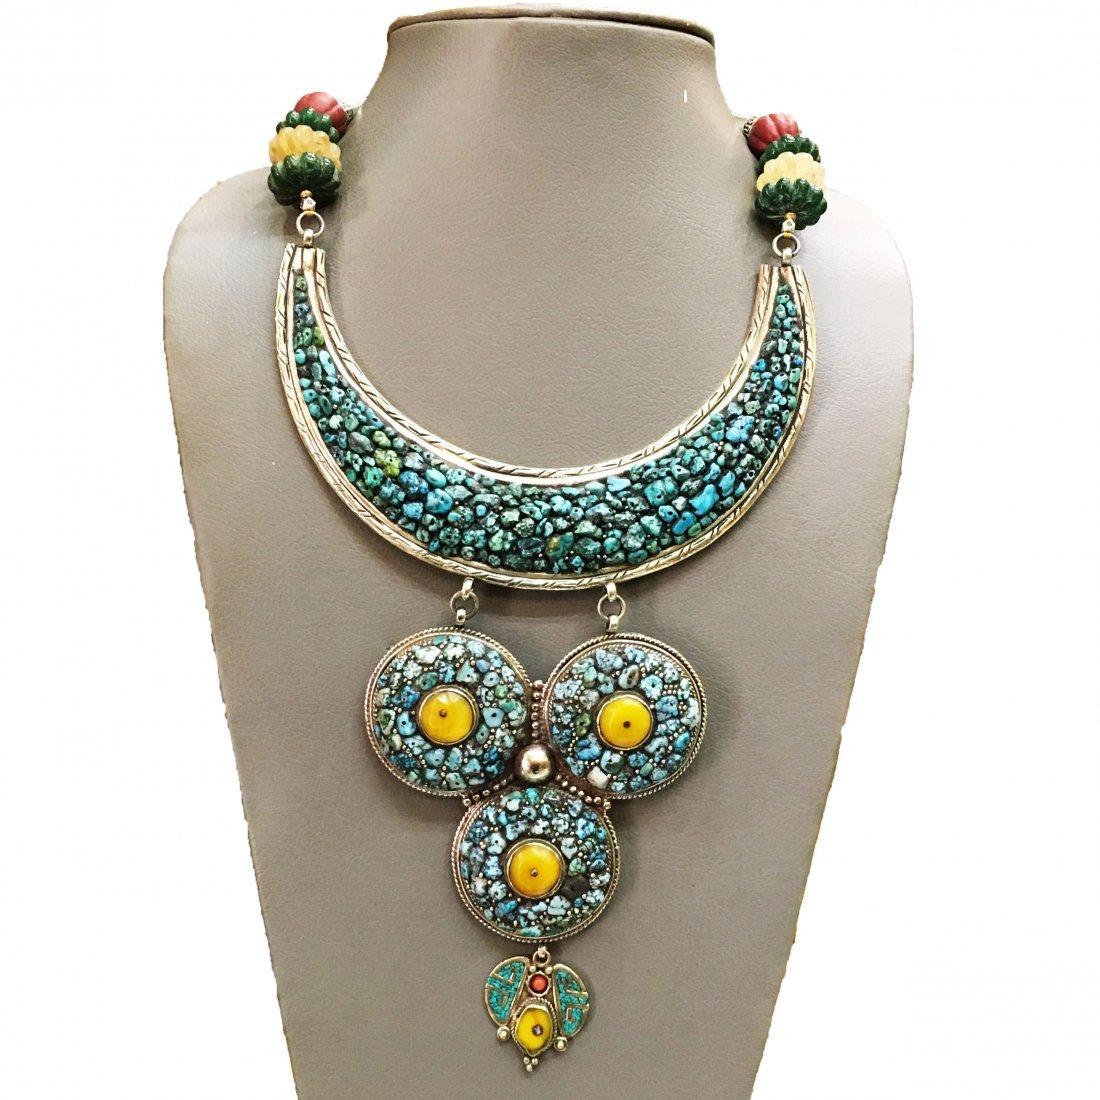 Vintage Ethnic Handmade Turquoise & Amber Necklace